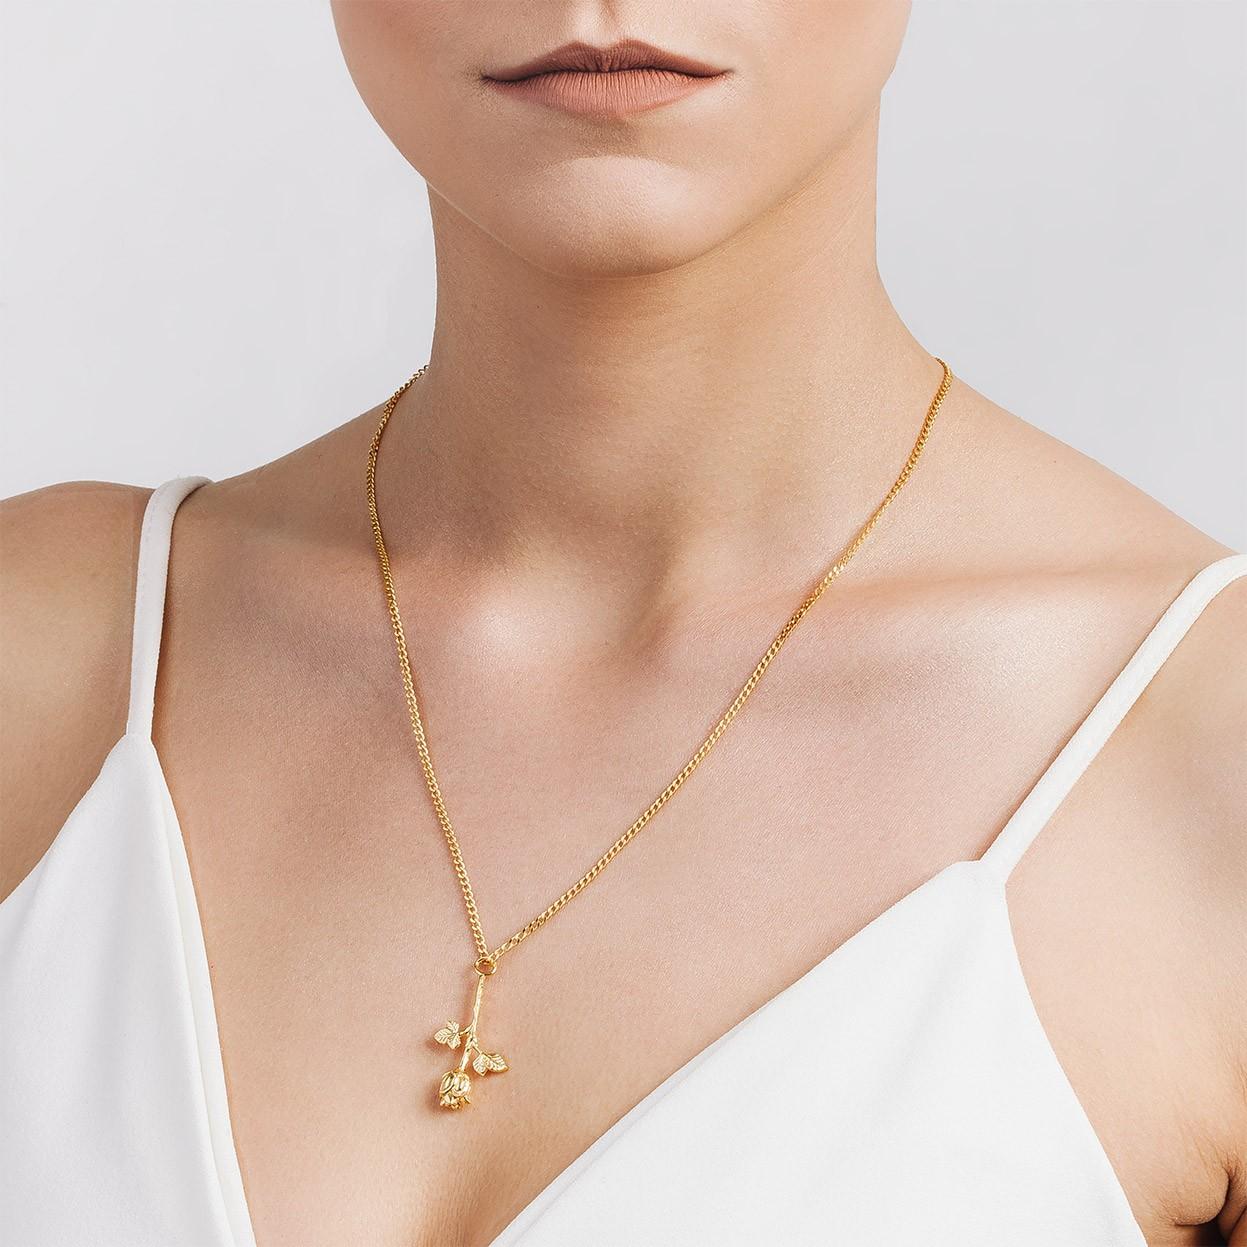 ROSA collar 925